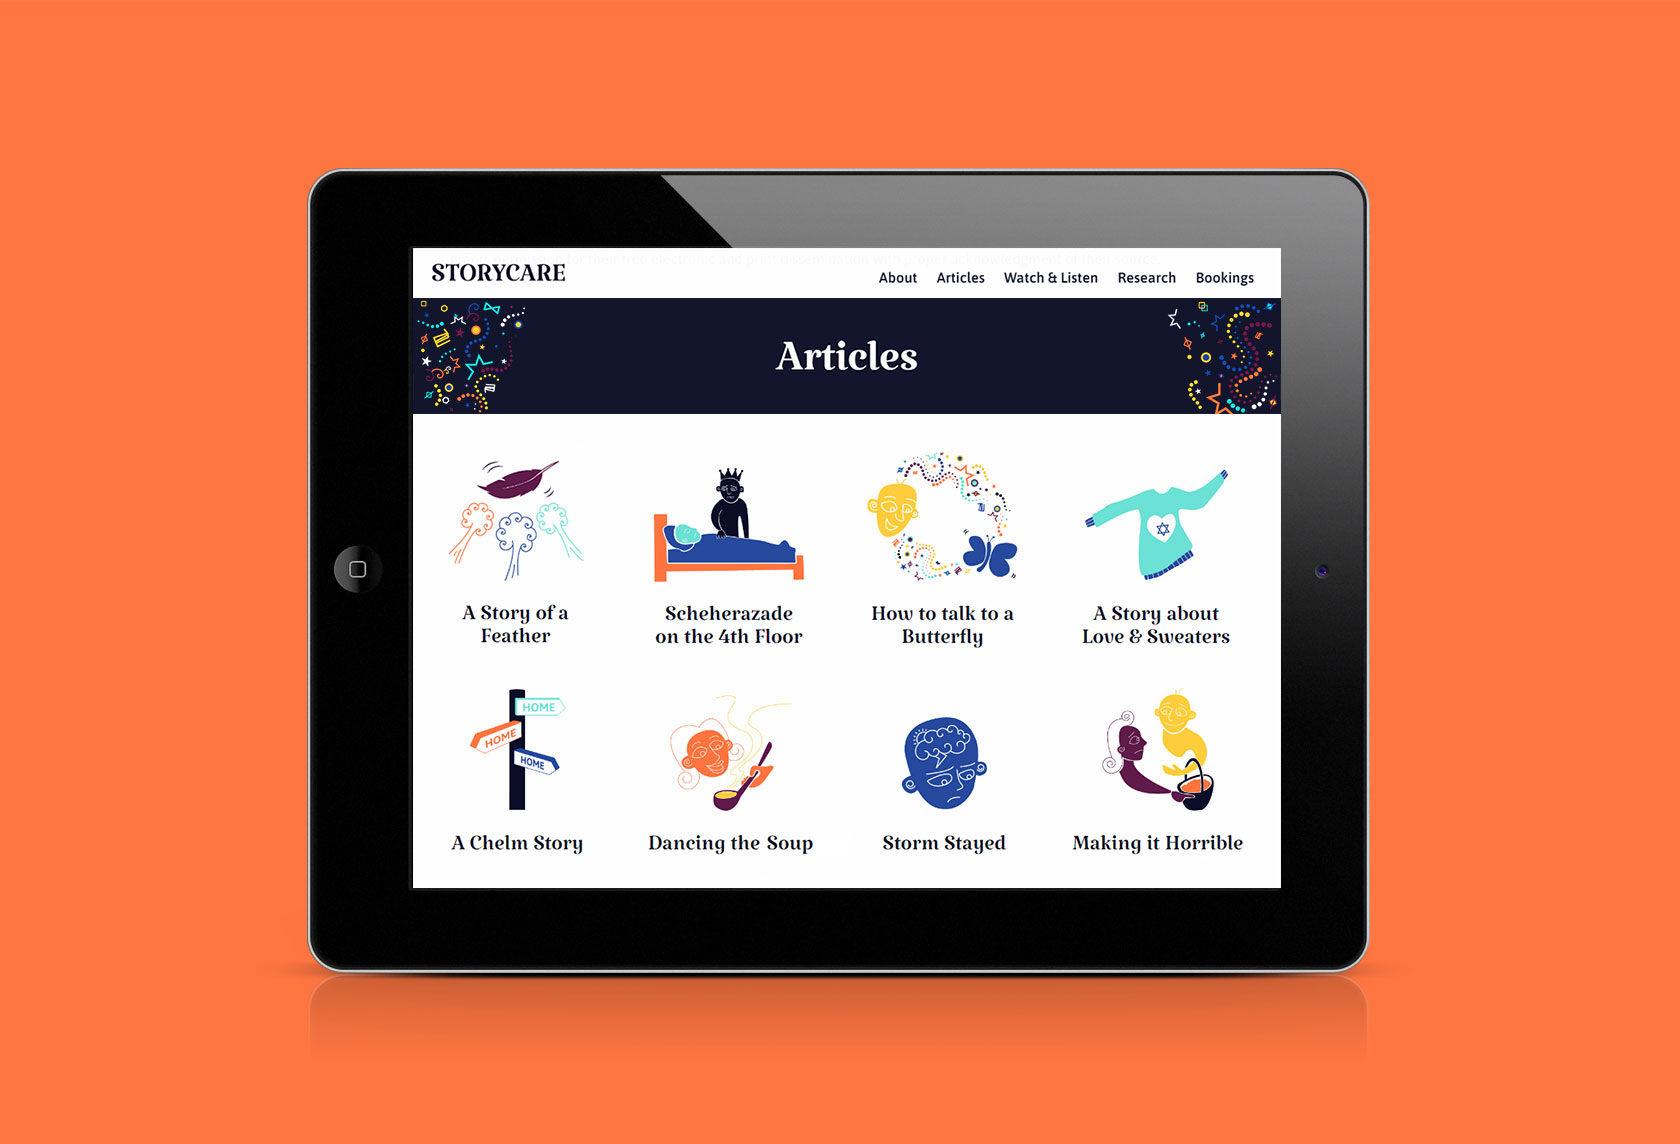 Storycare Responsive Website Design and Development by Furia